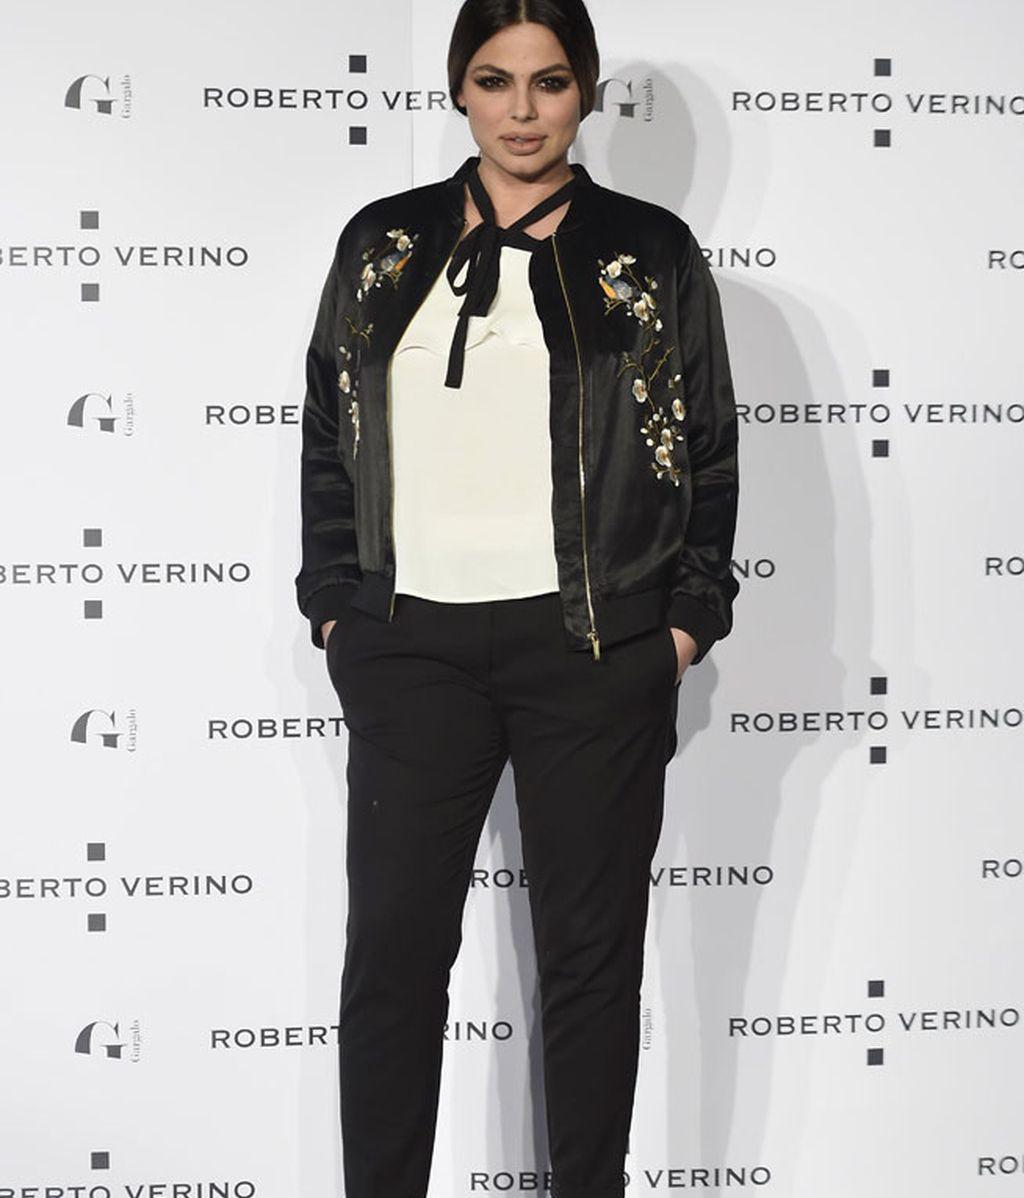 Marisa Jara con chaqueta negra satinada bordada